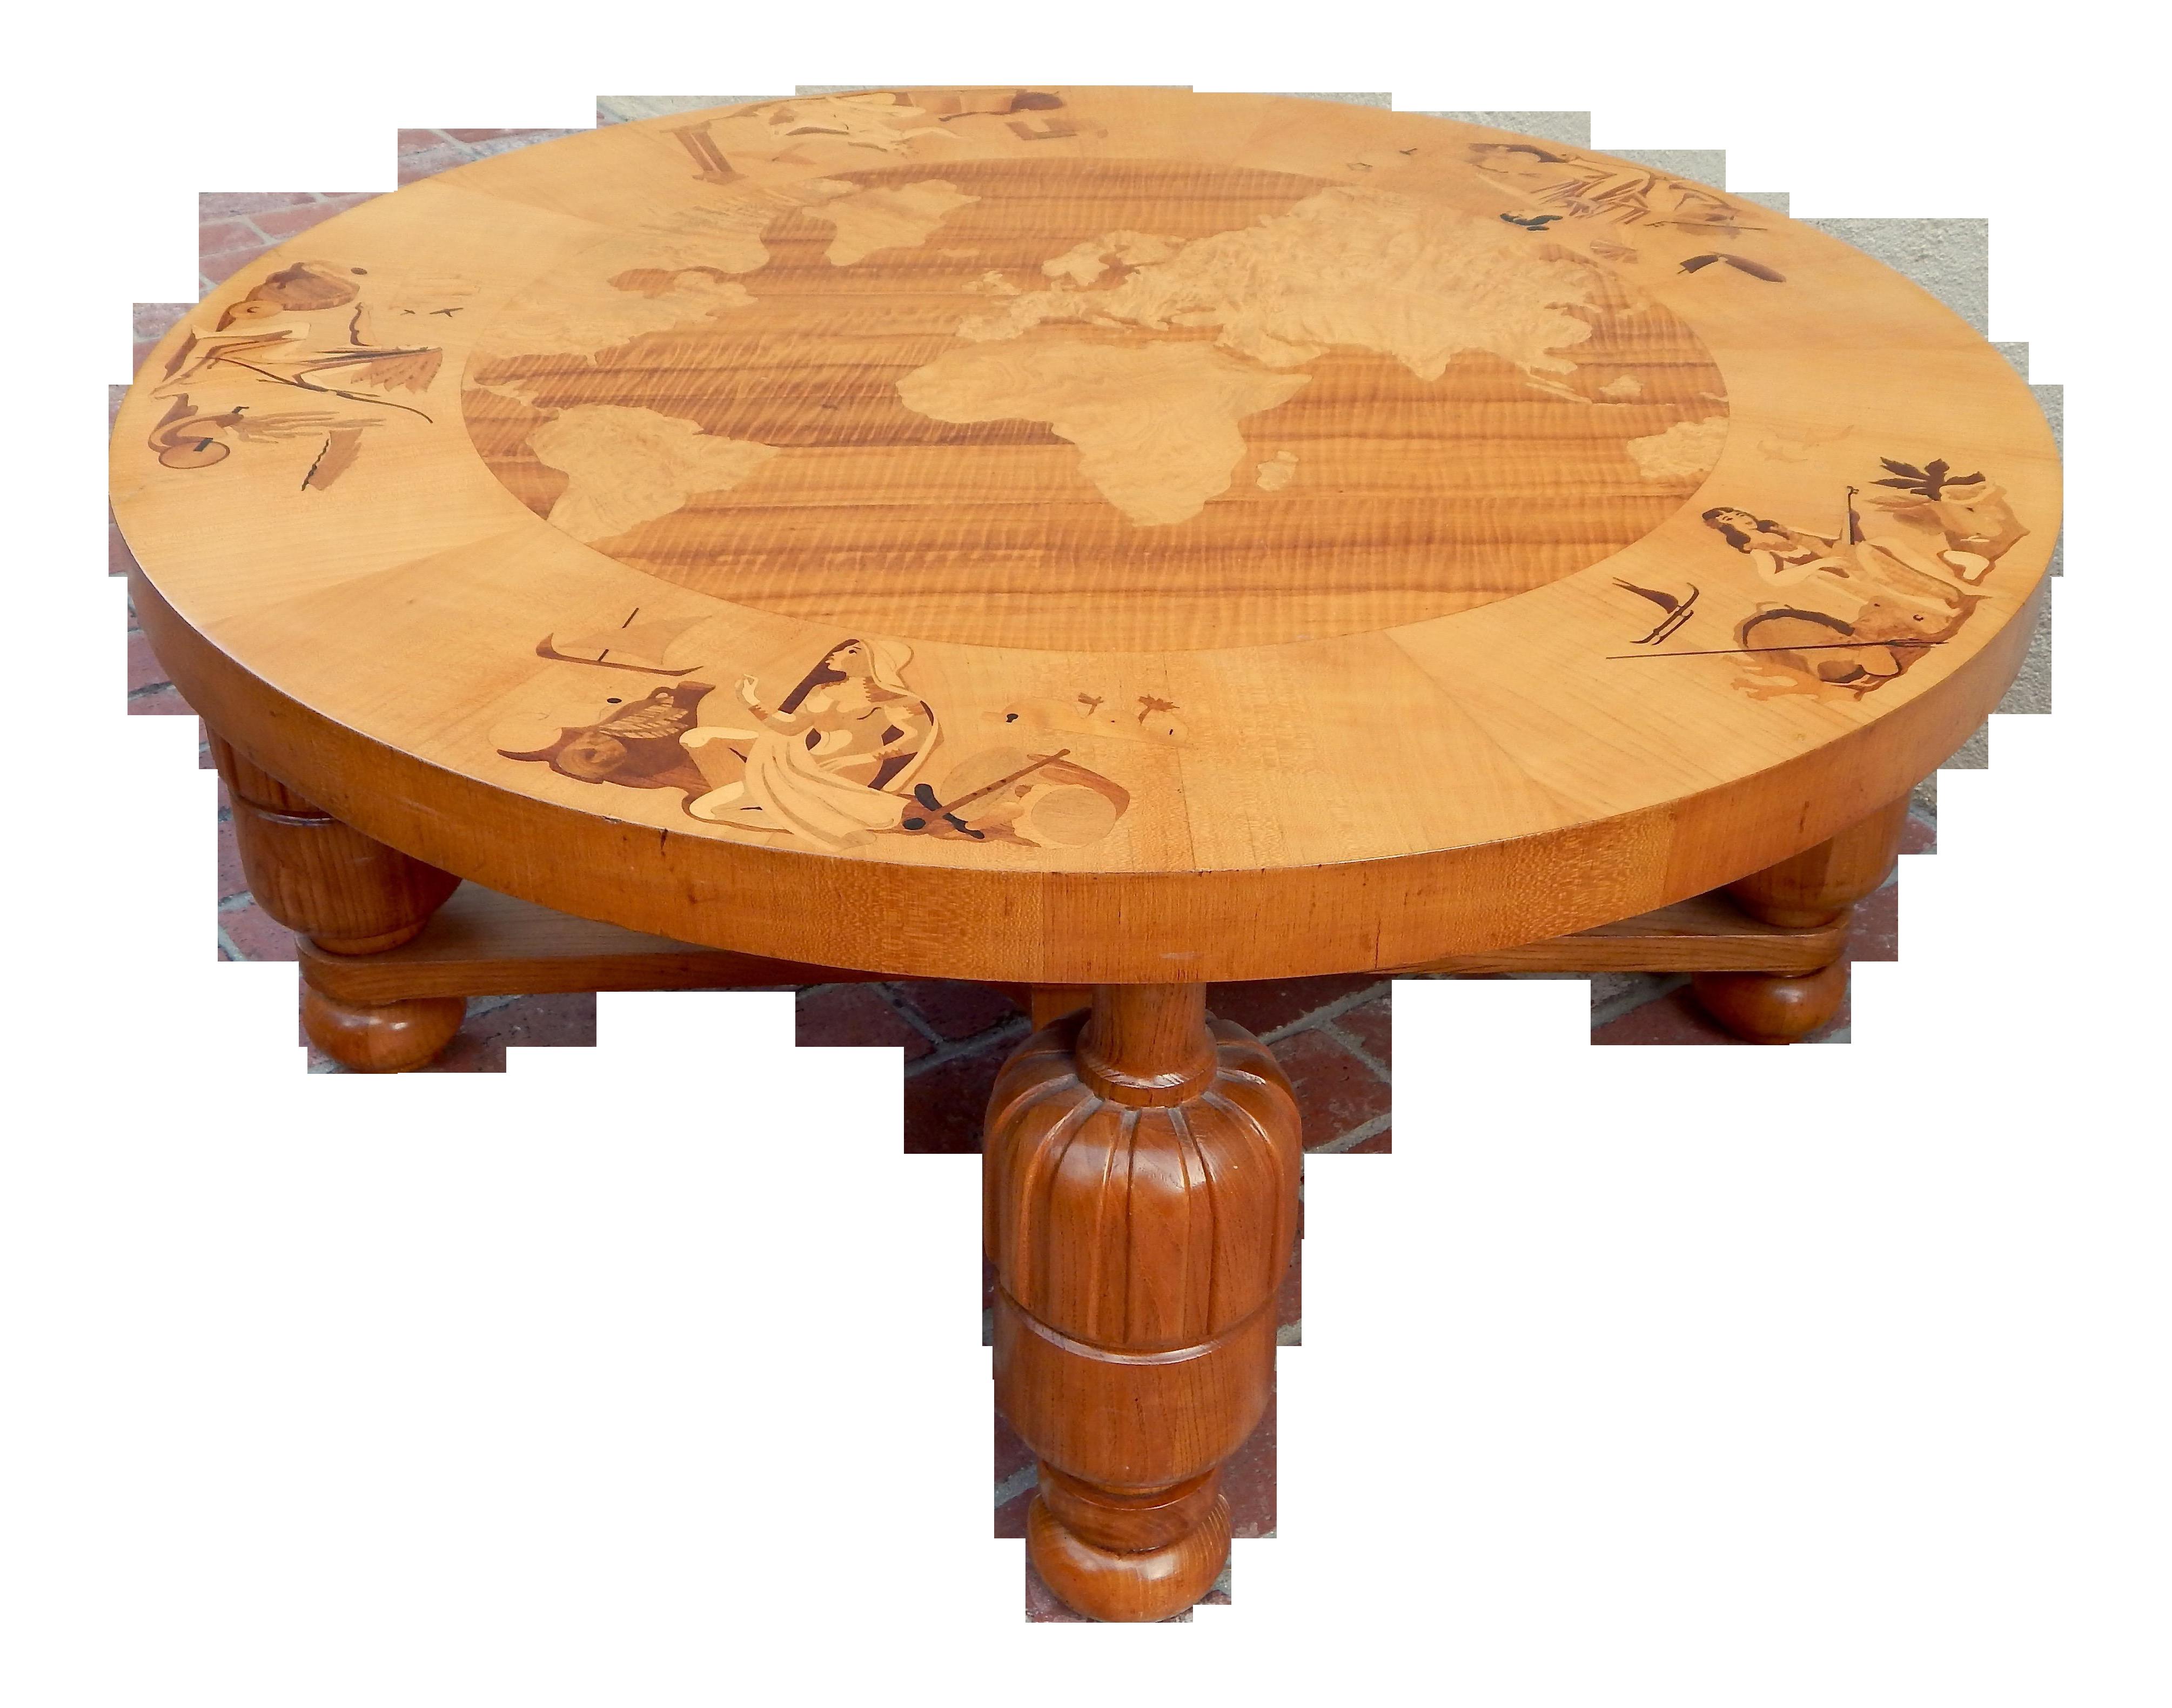 Luxury swedish art deco inlaid coffee table vrlden runt by luxury swedish art deco inlaid coffee table vrlden runt by birger ekman for reiners mbler circa 1930 decaso geotapseo Choice Image